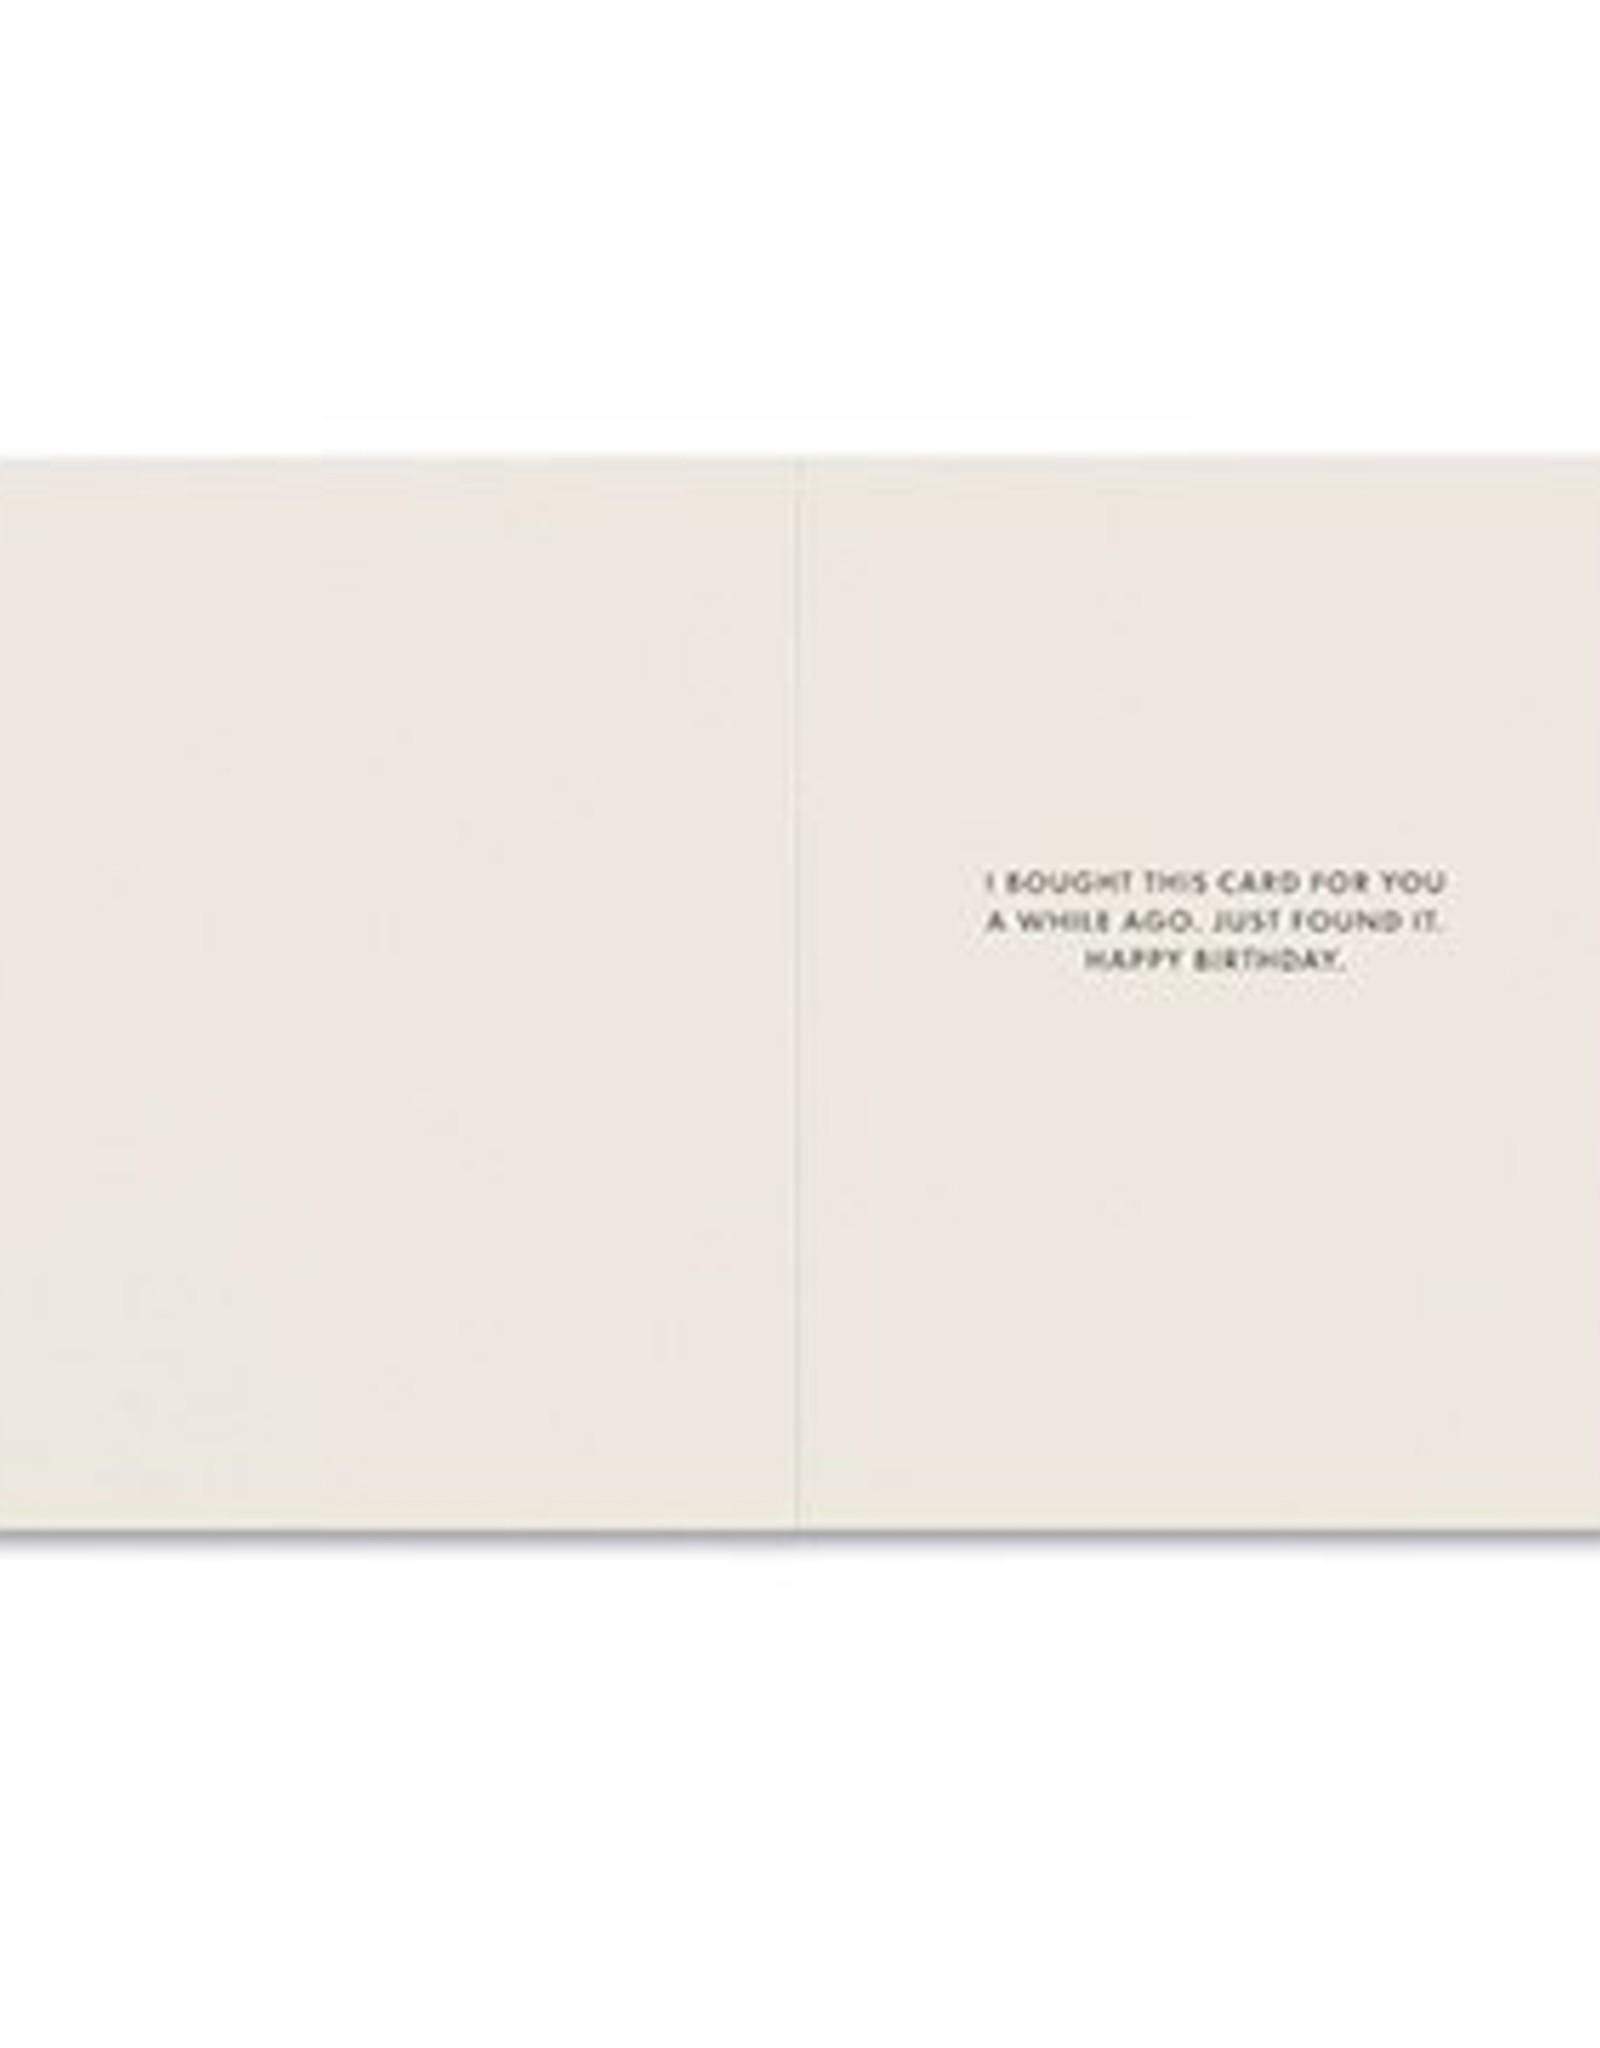 Frank & Funny Birthday Card- 5077